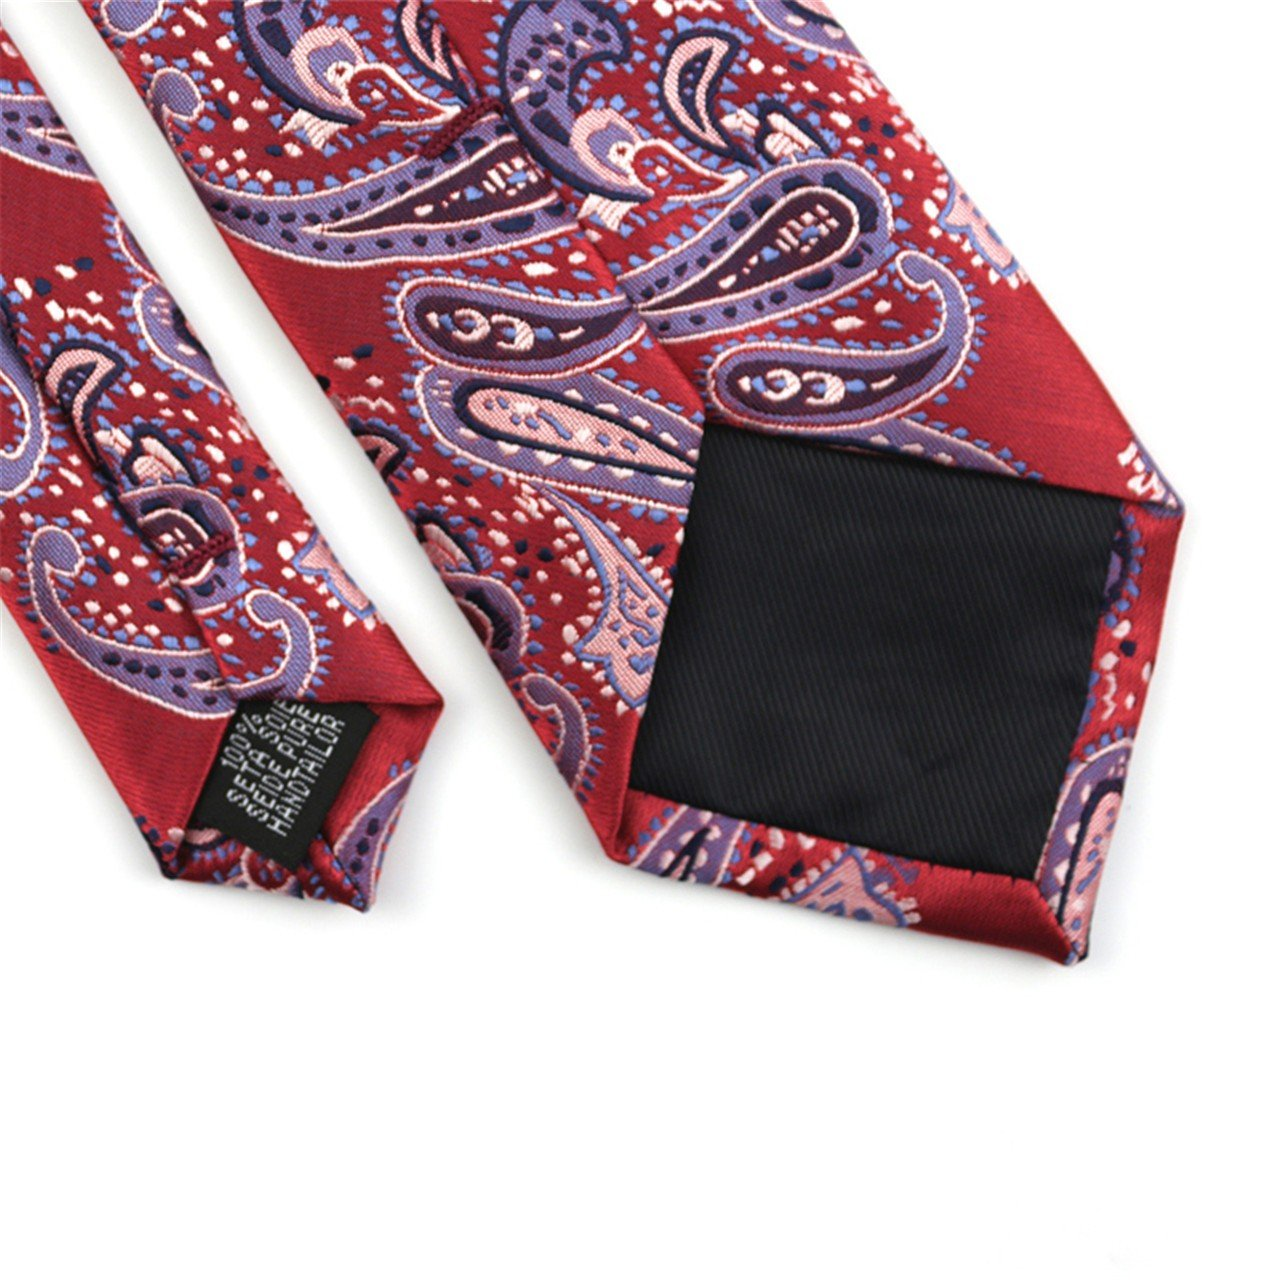 HXCMAN 7cm red flower floral 100/% silk classic design men tie necktie all-match party business evening wedding groom in gift box